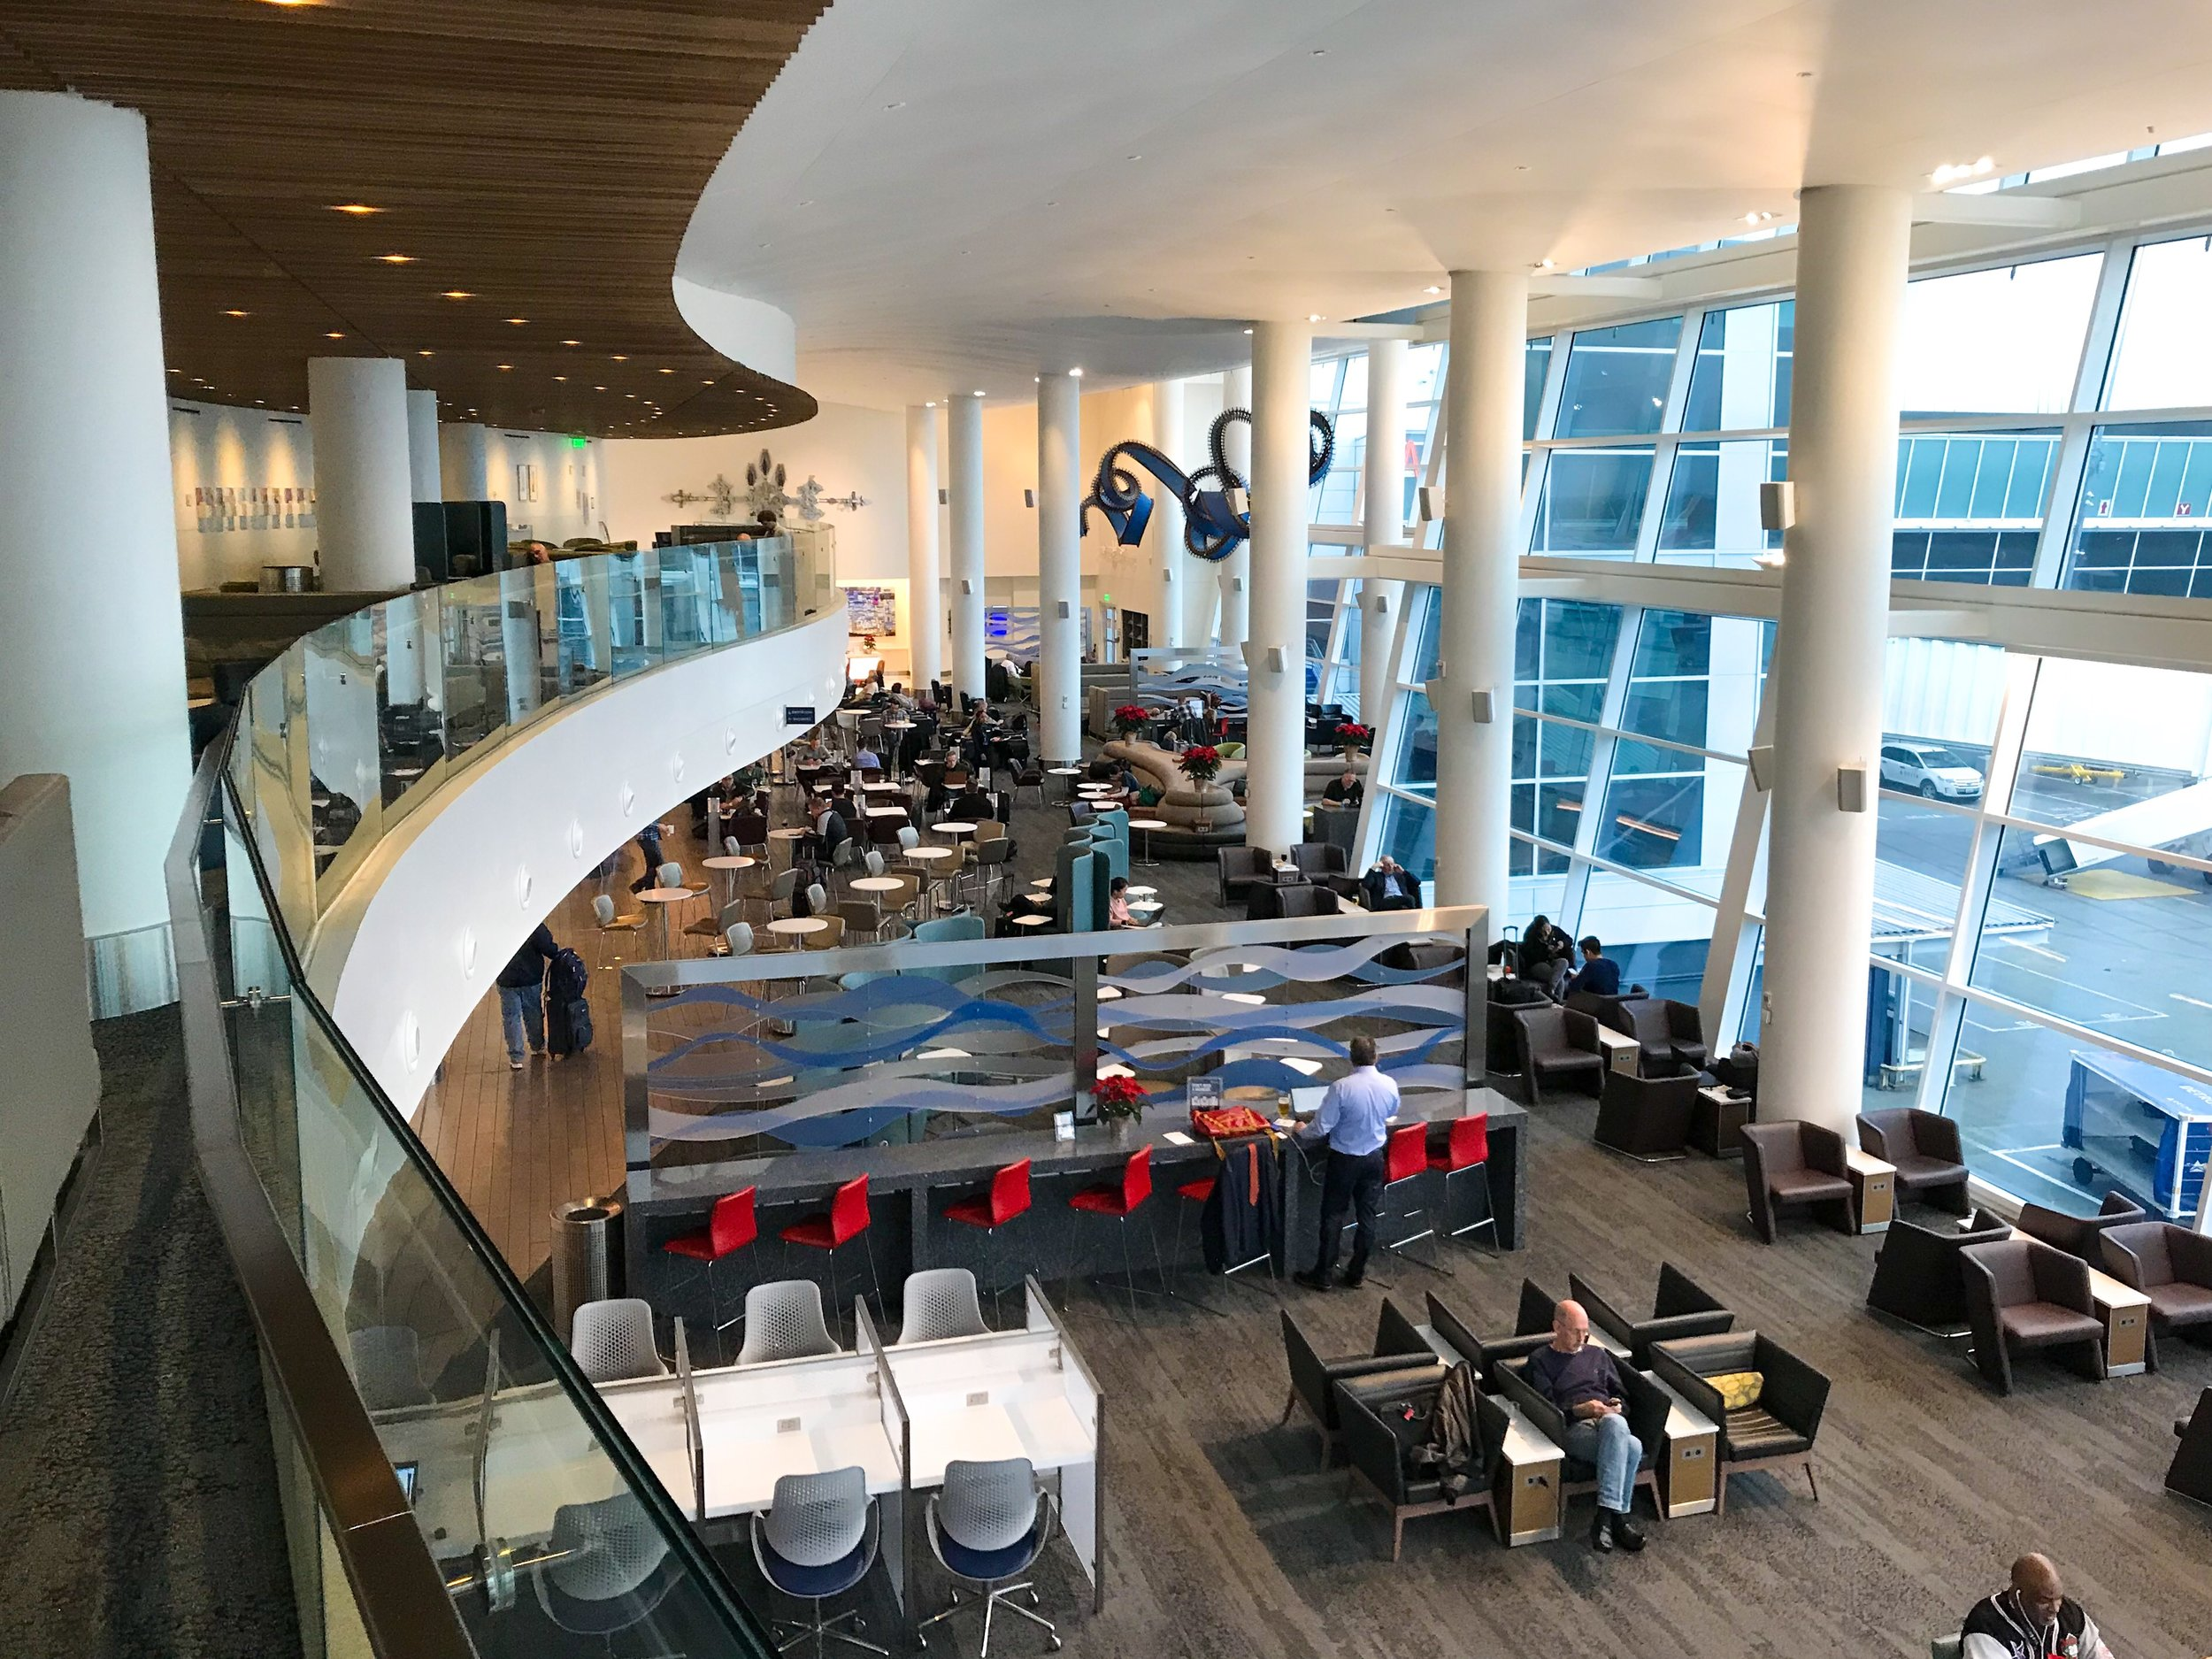 SEATTLE/TACOMA - 2 Sky Club Locations